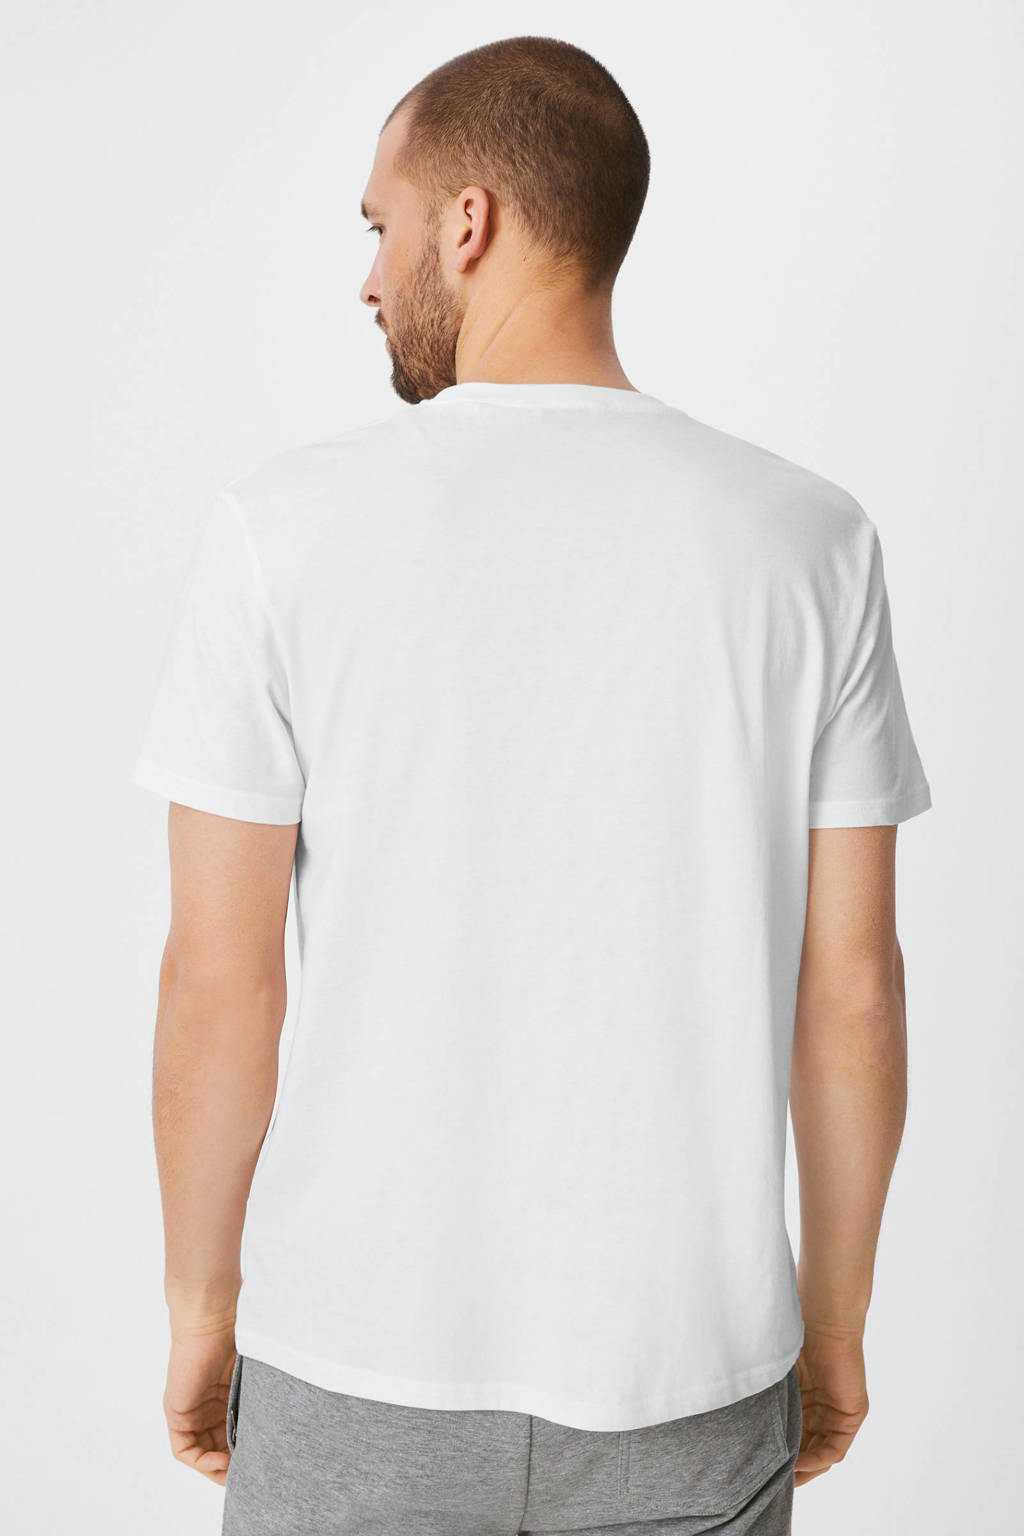 C&A Canda T-shirt - (set van 5), Wit